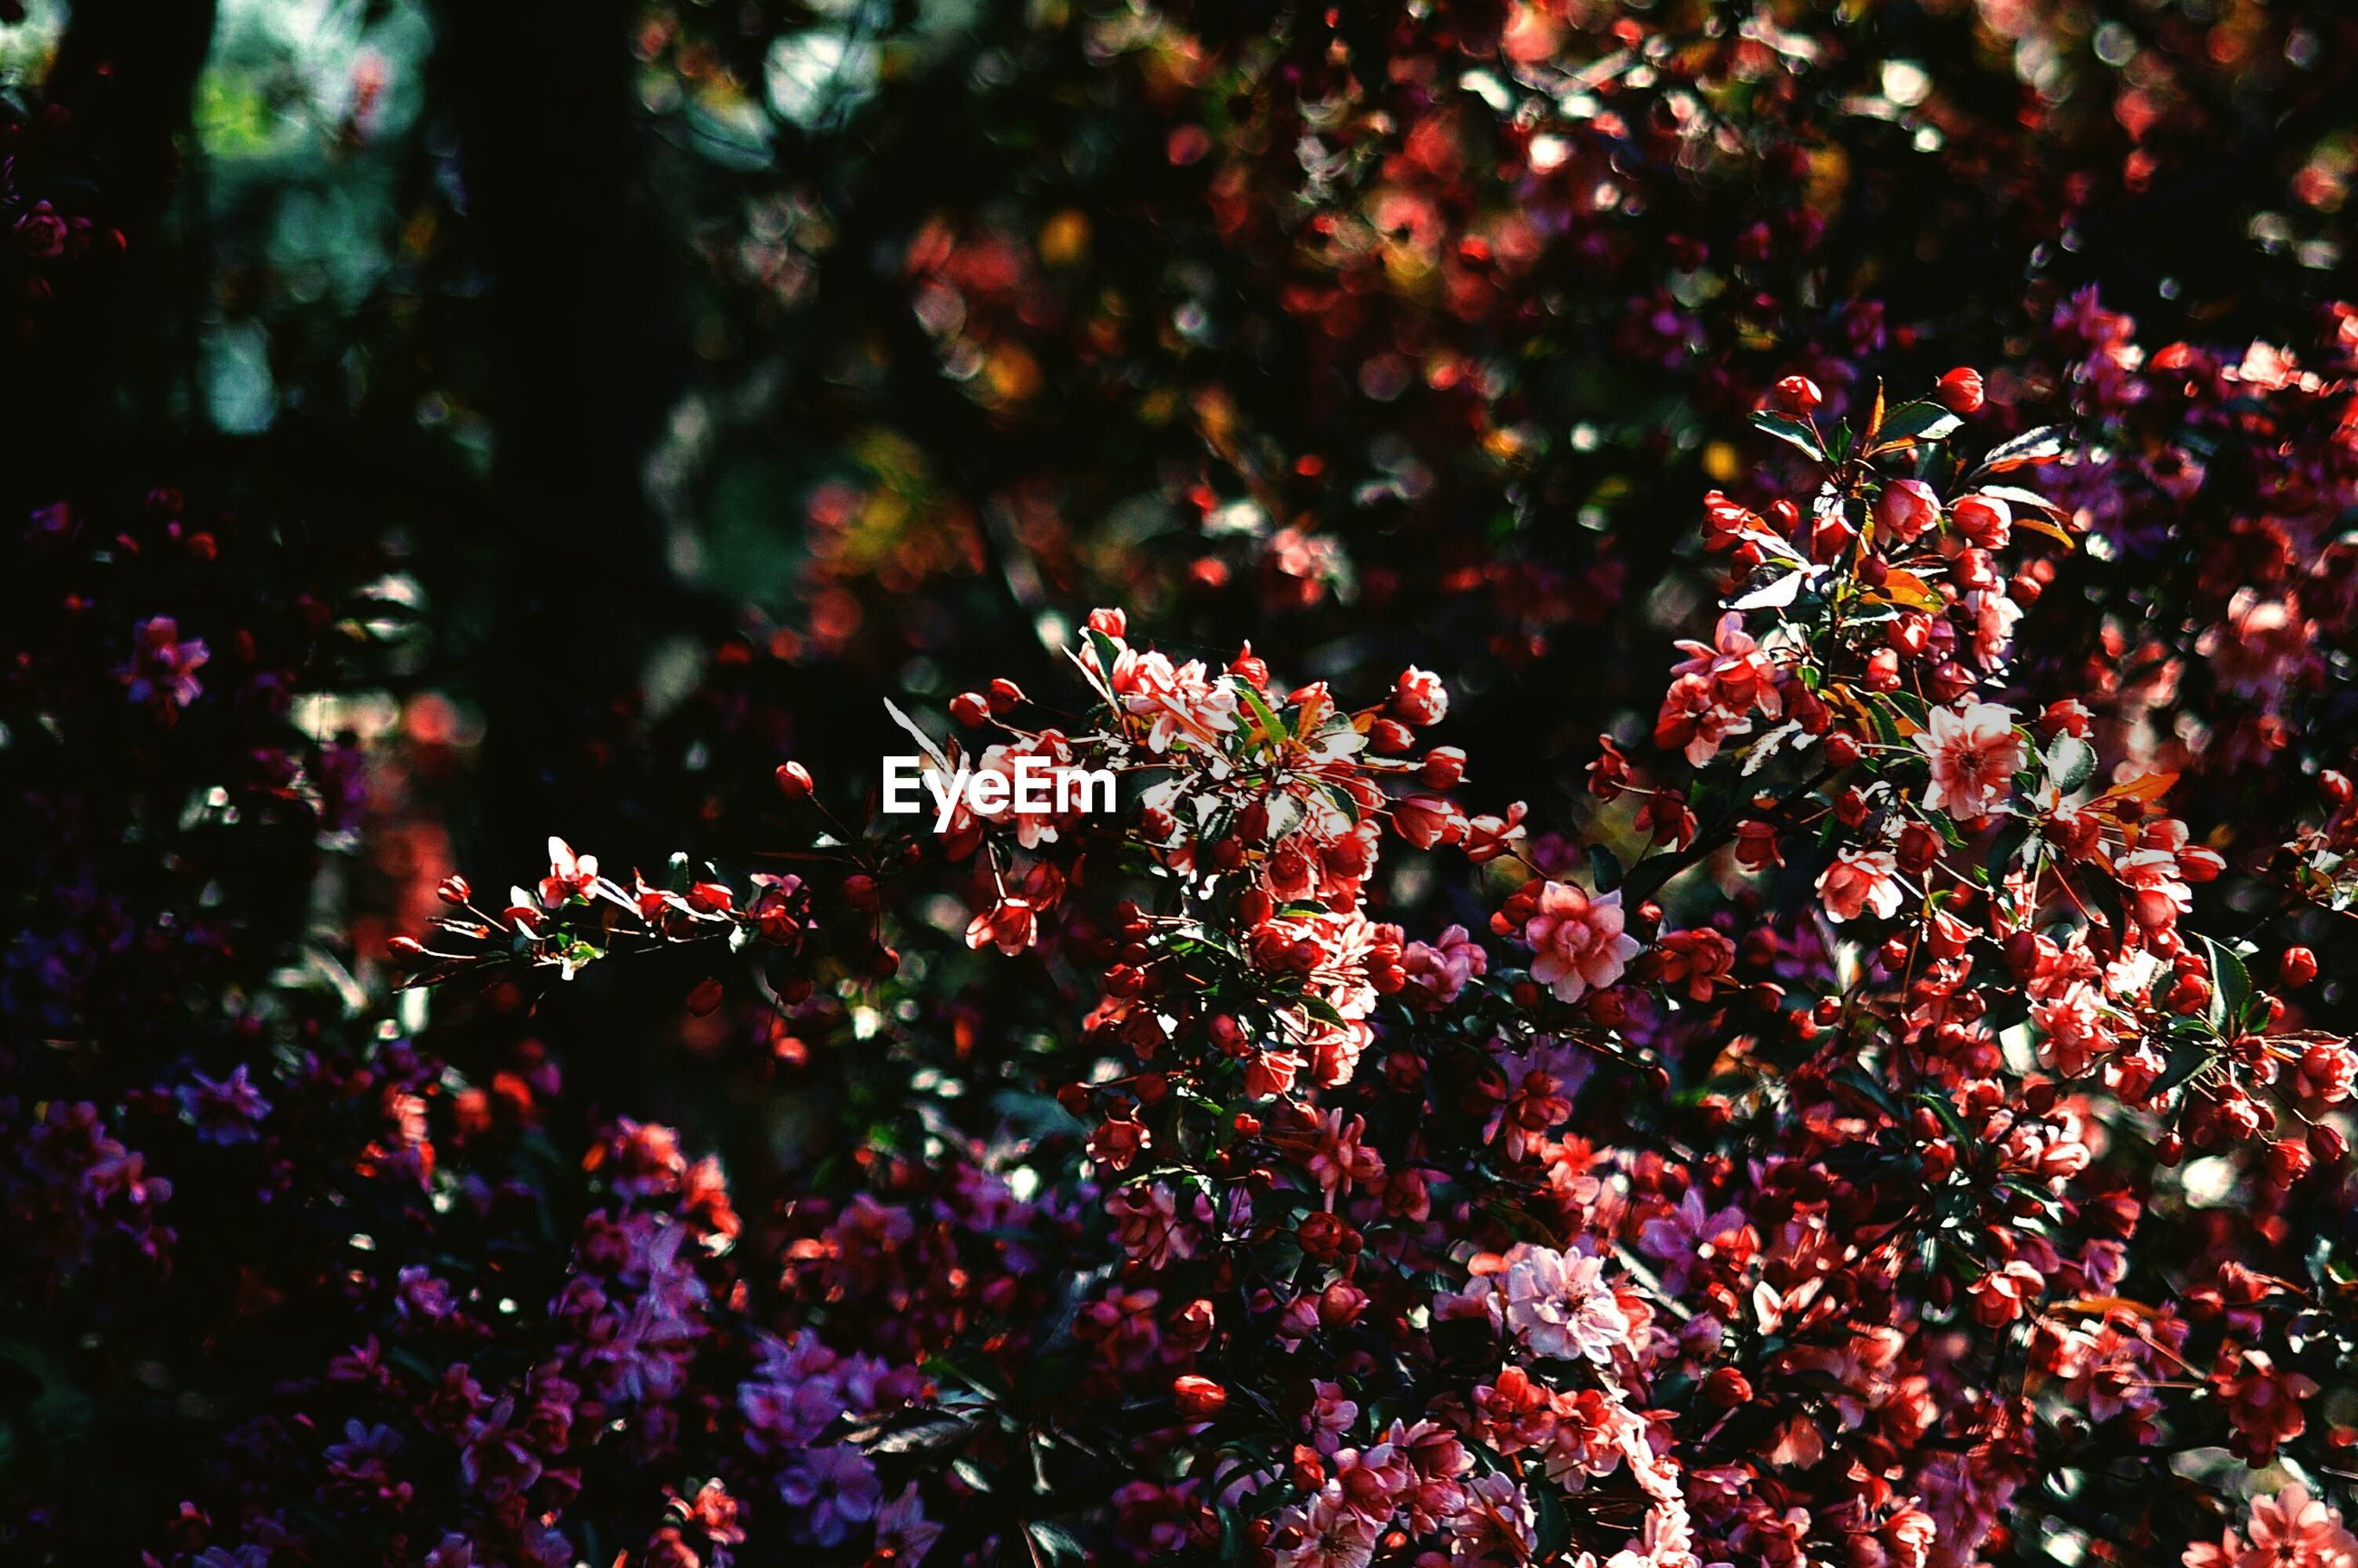 PINK FLOWERS GROWING ON TREE